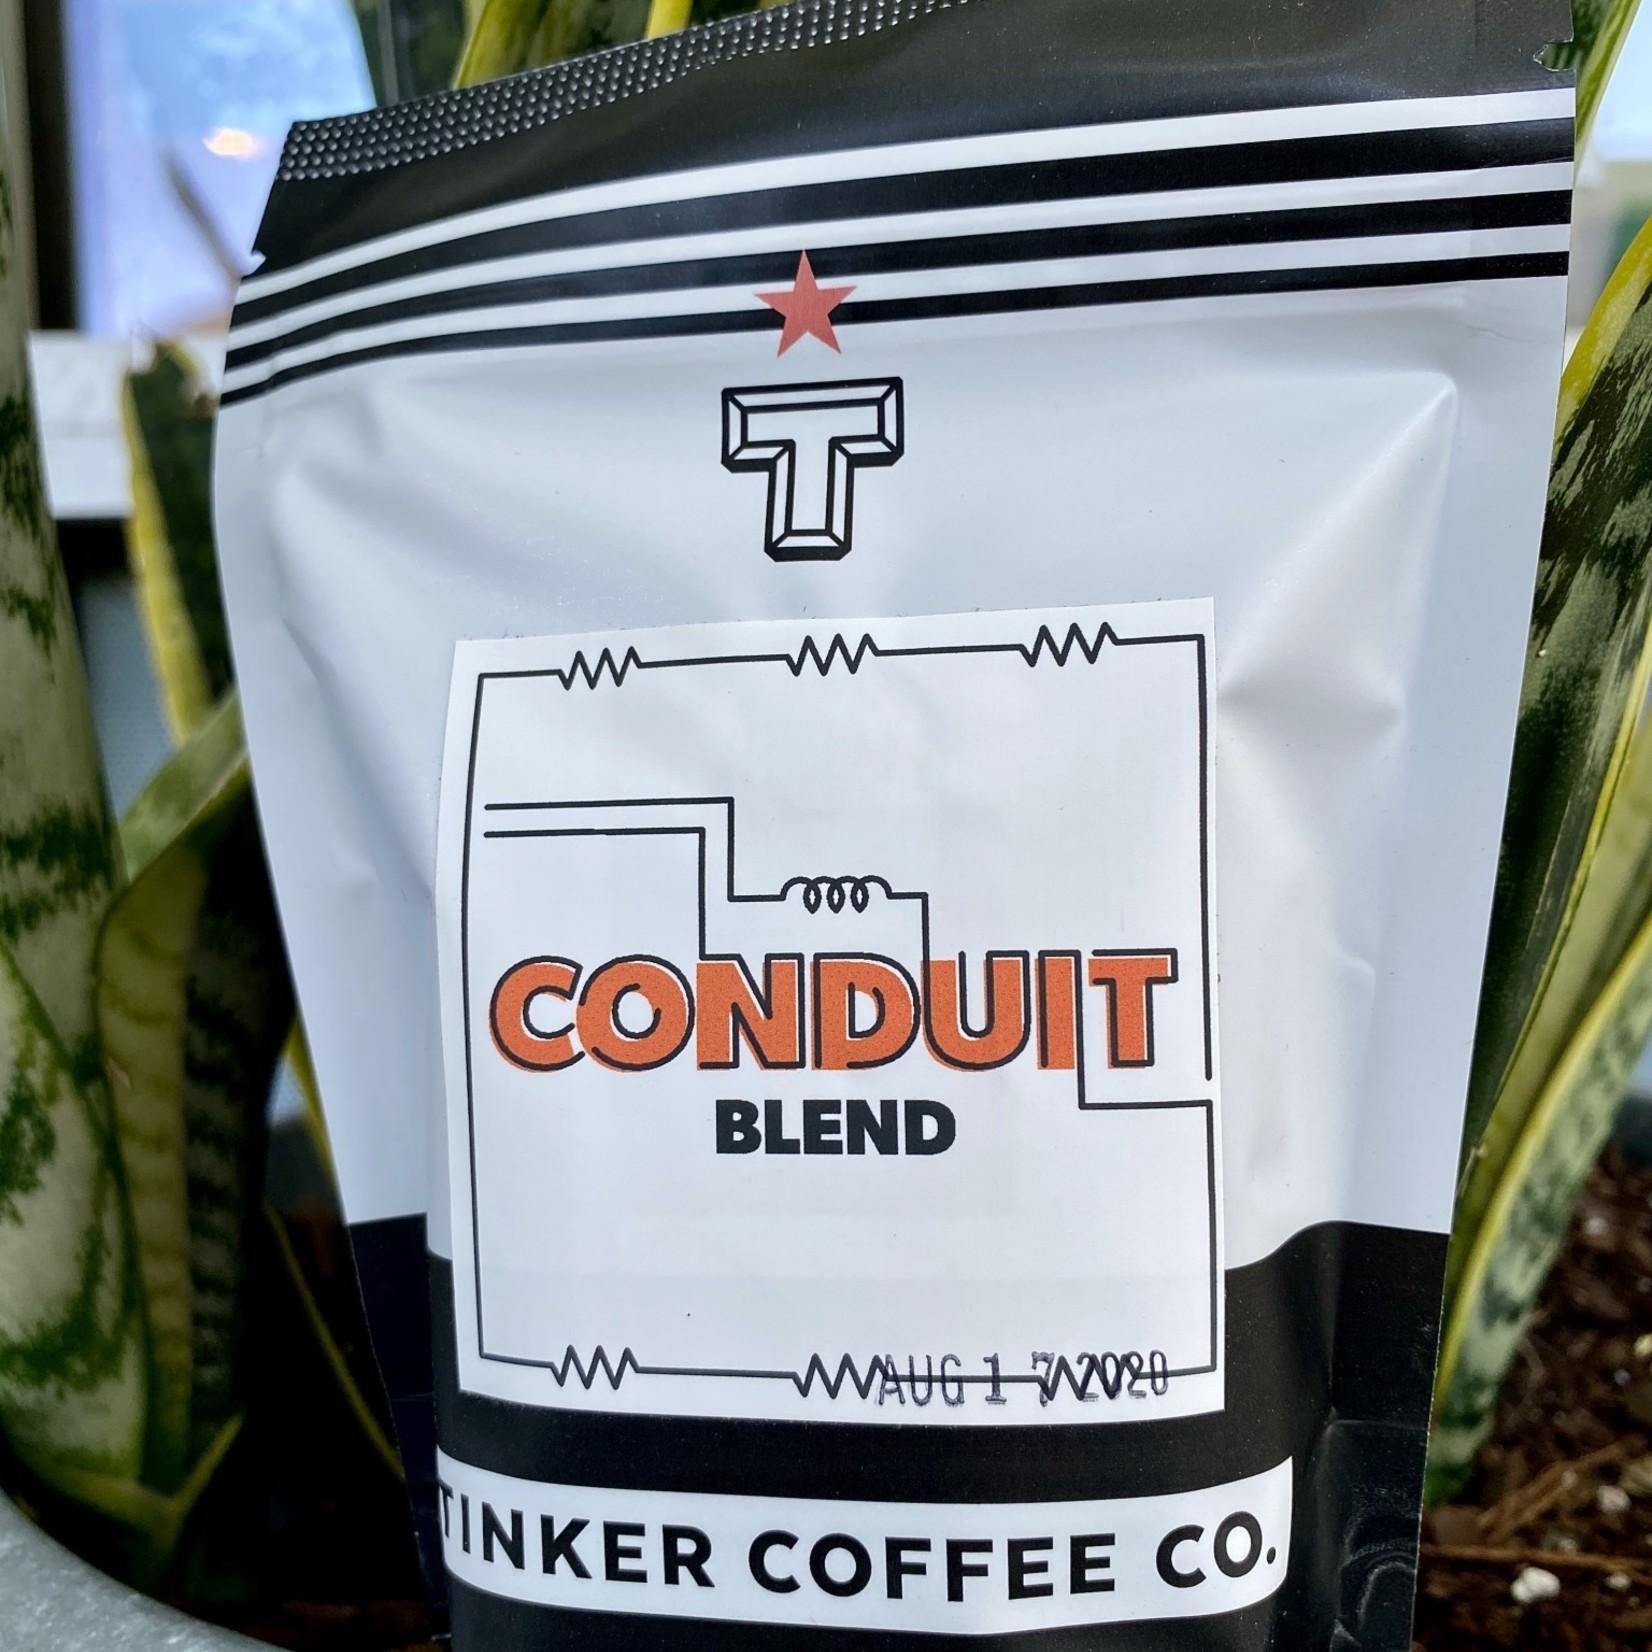 Tinker Coffee Co. Conduit Blend Whole Bean Coffee 4oz. Bag